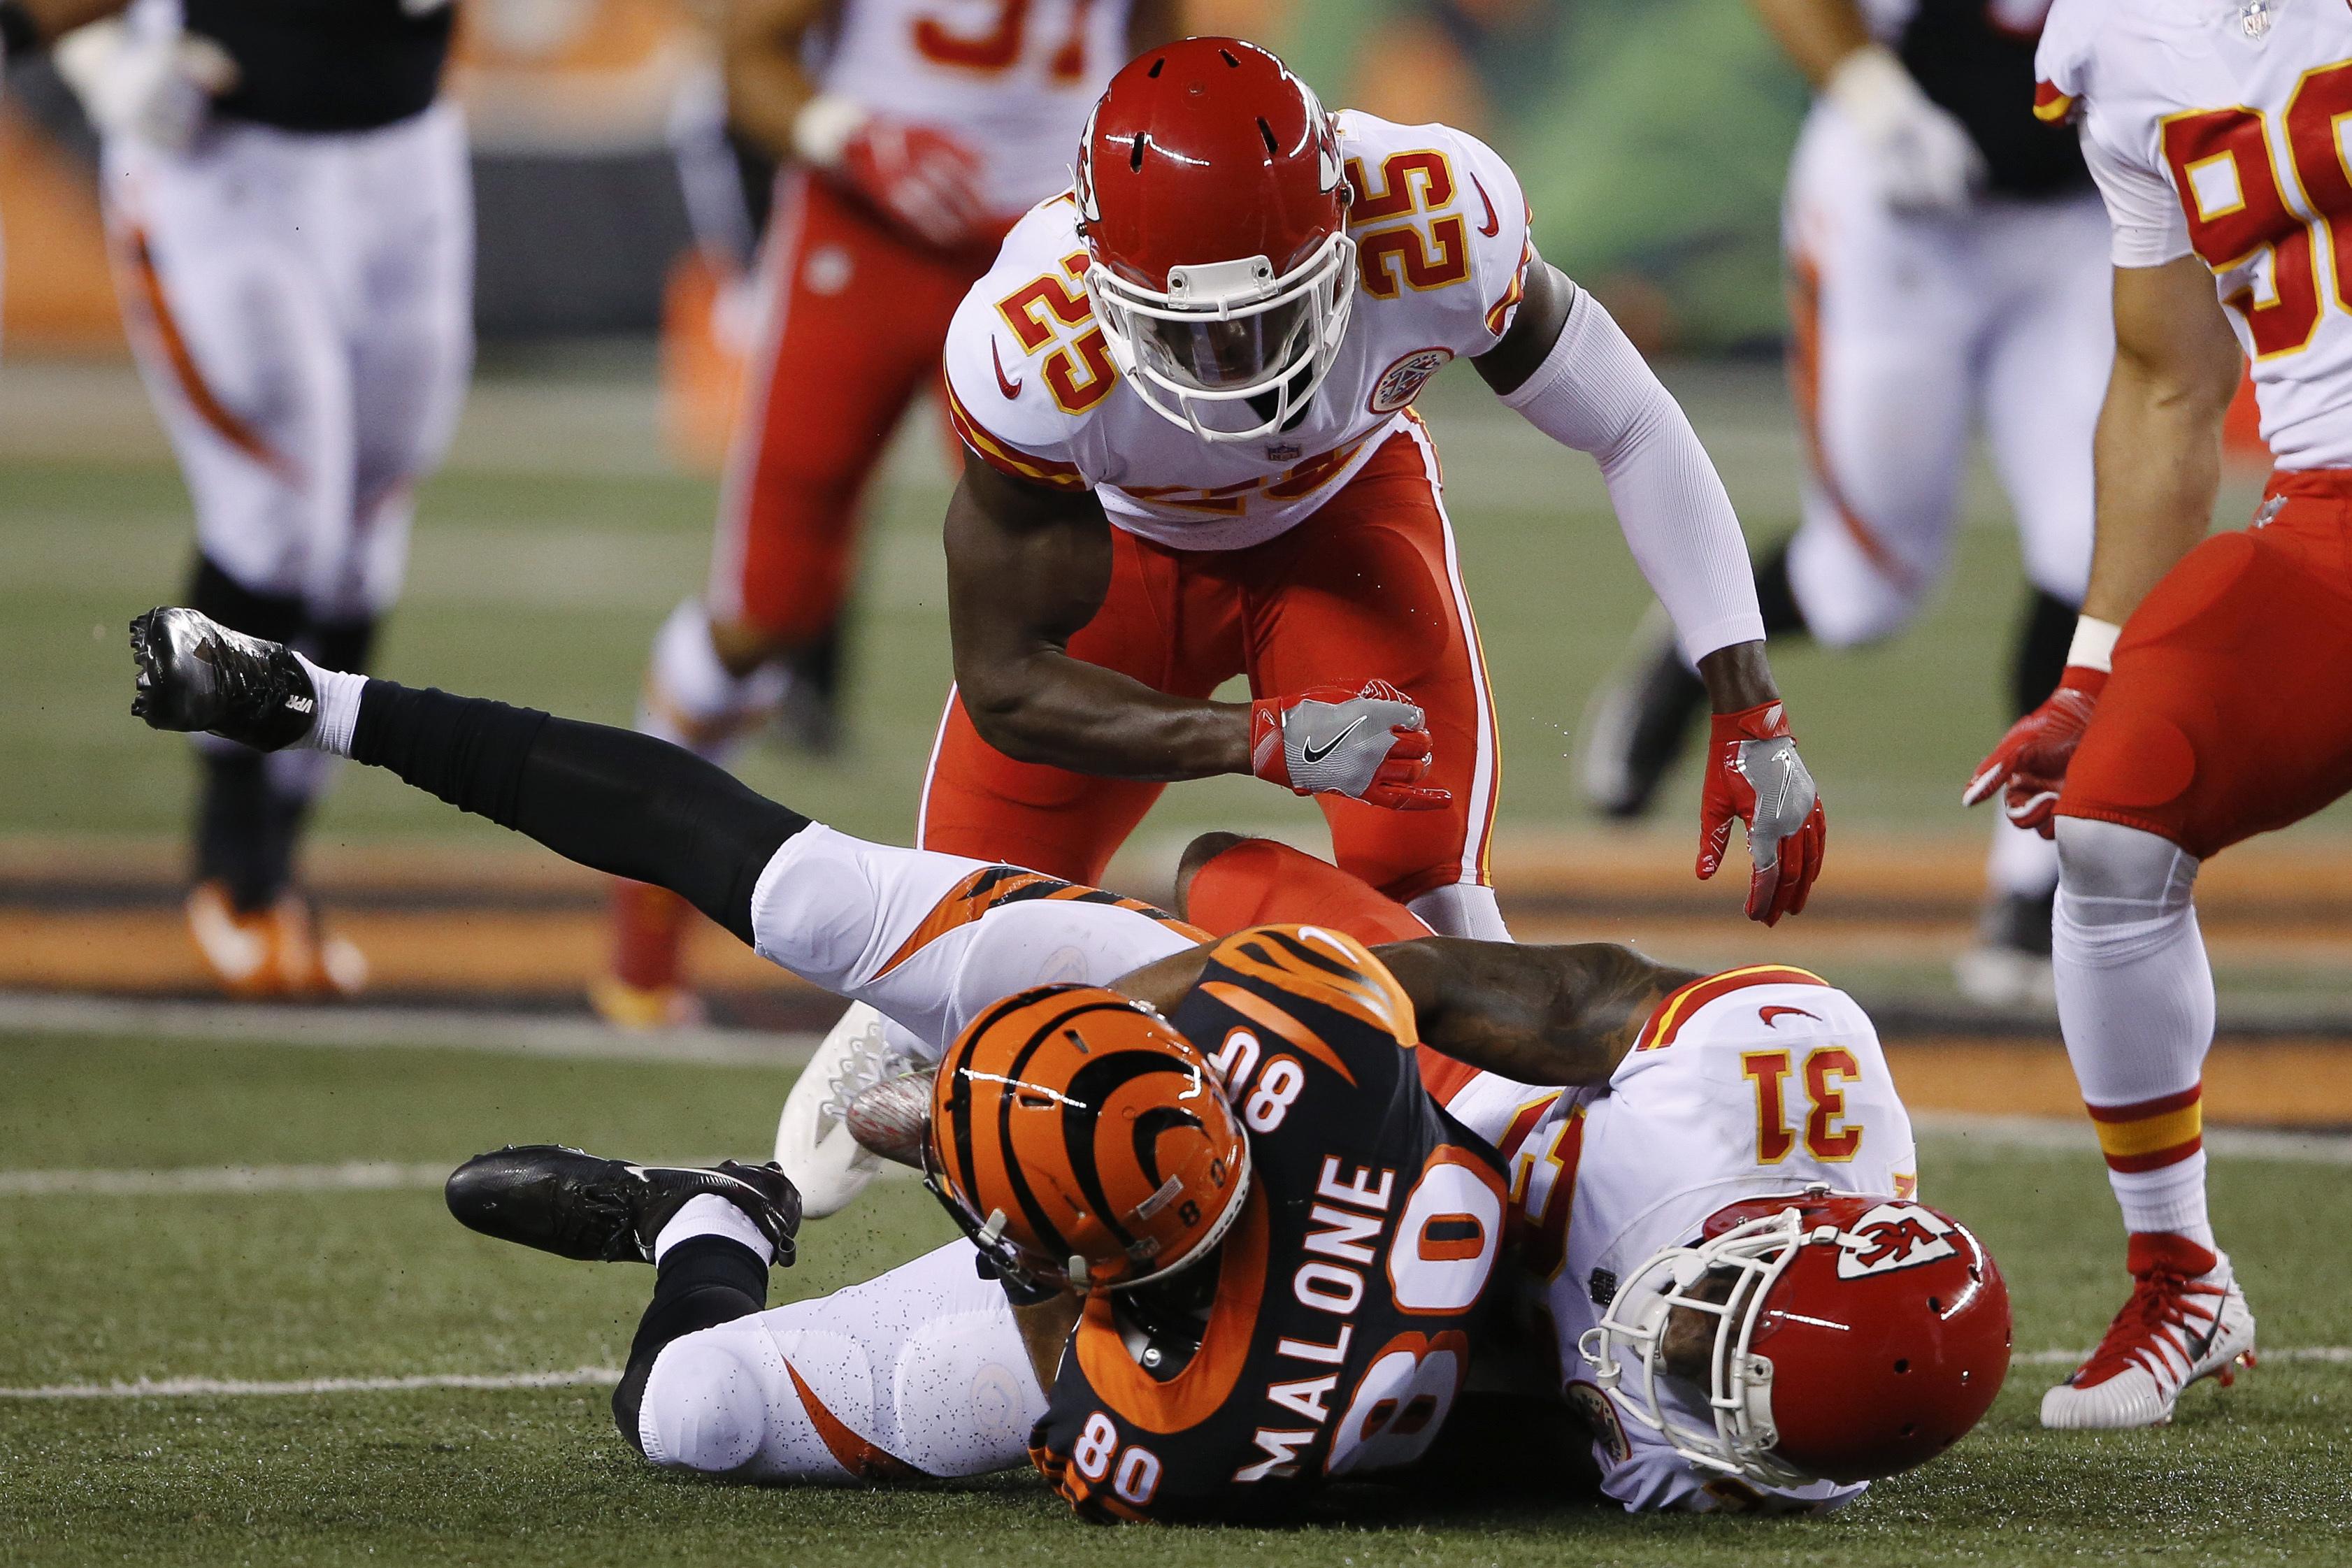 Chiefs cornerback DeVante Bausby (31) tackling Bengals wide receiver Josh Malone (80) during a preseason game last August.